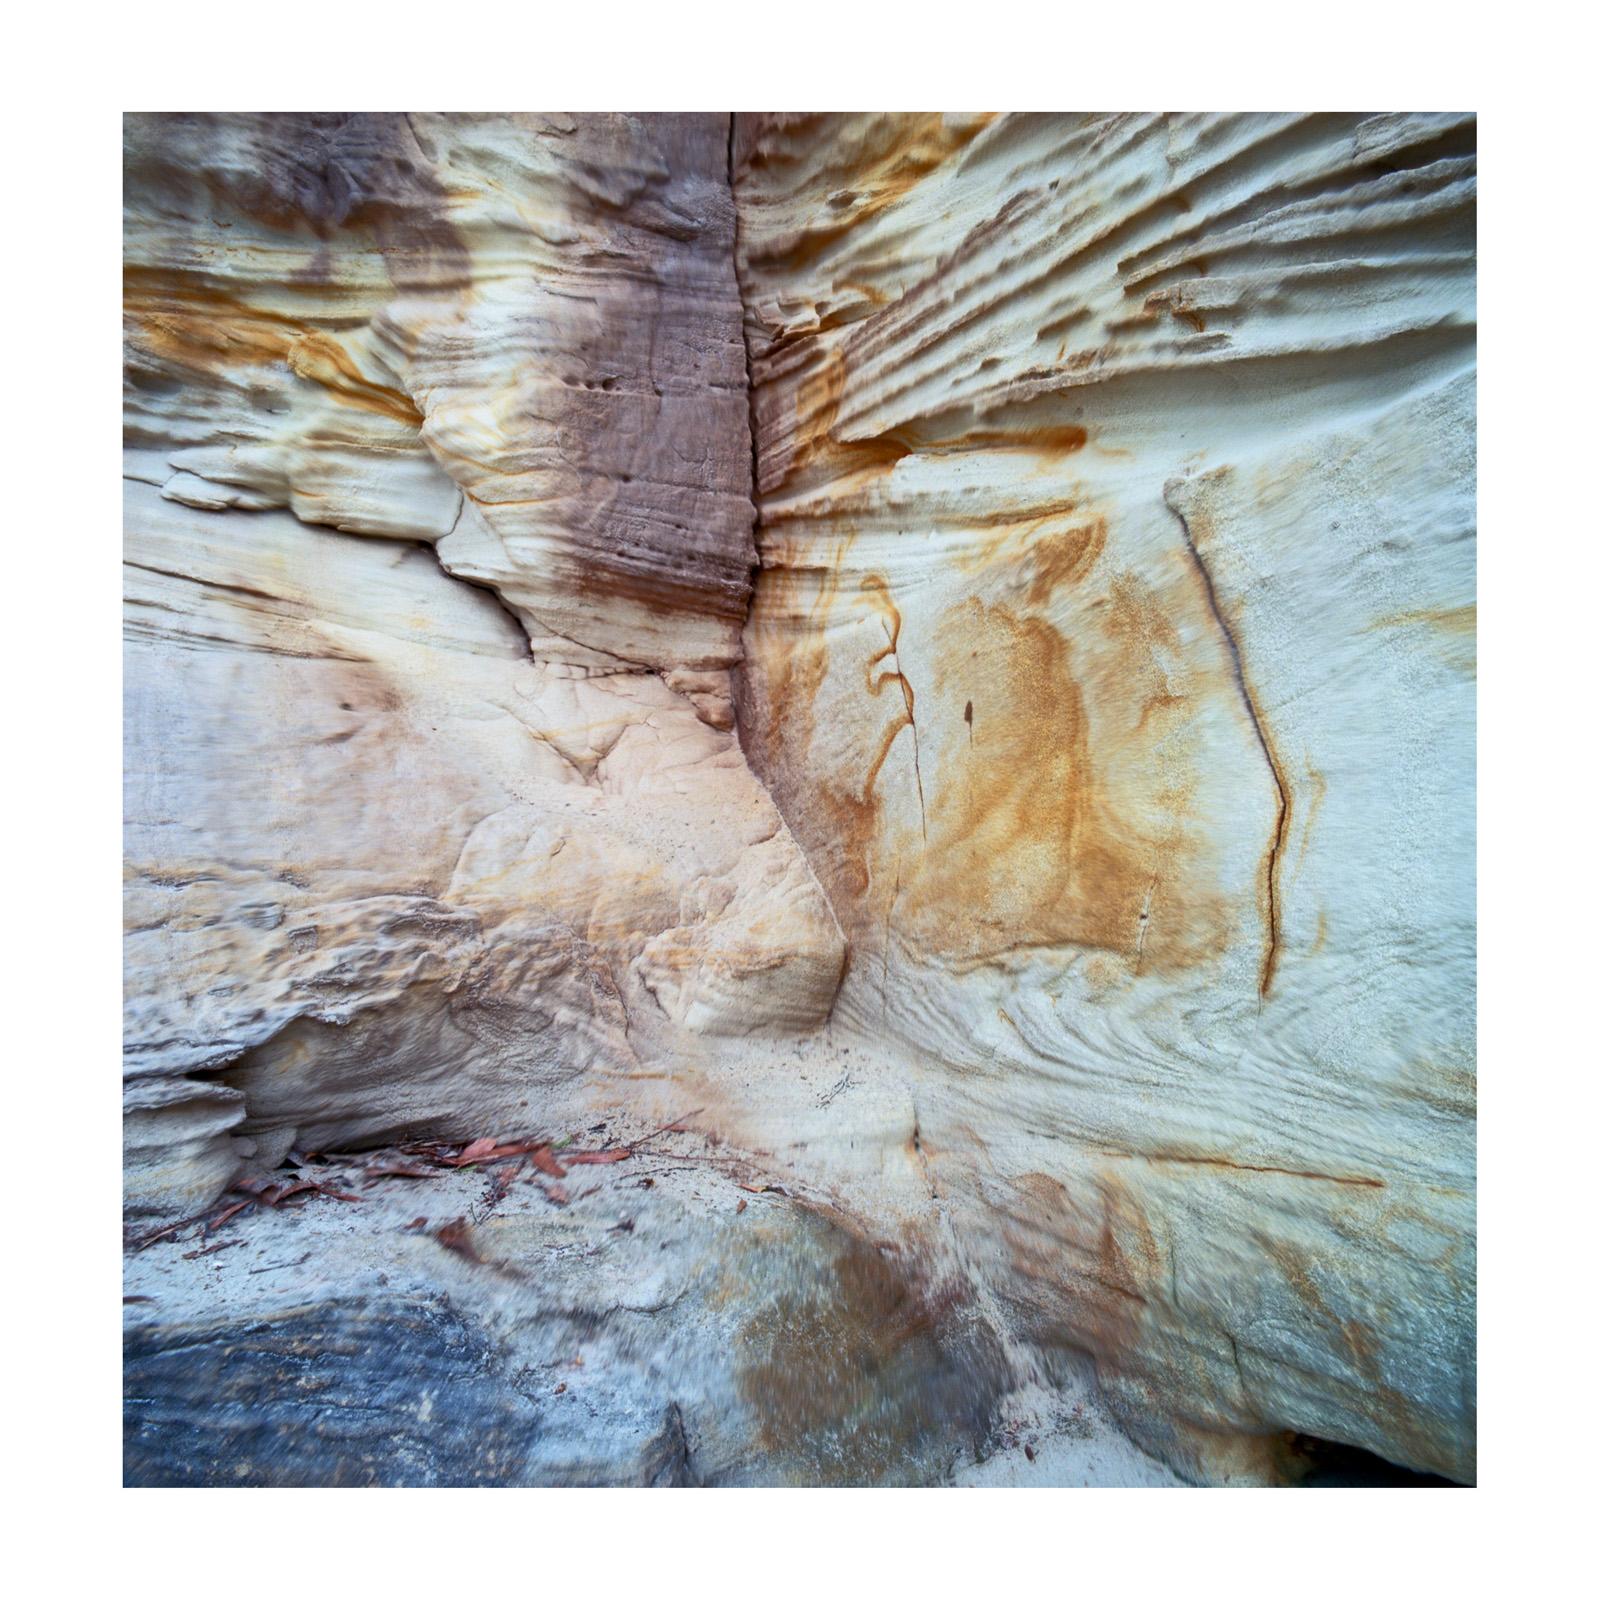 TasmaniaBrunysandstonestrange.jpg